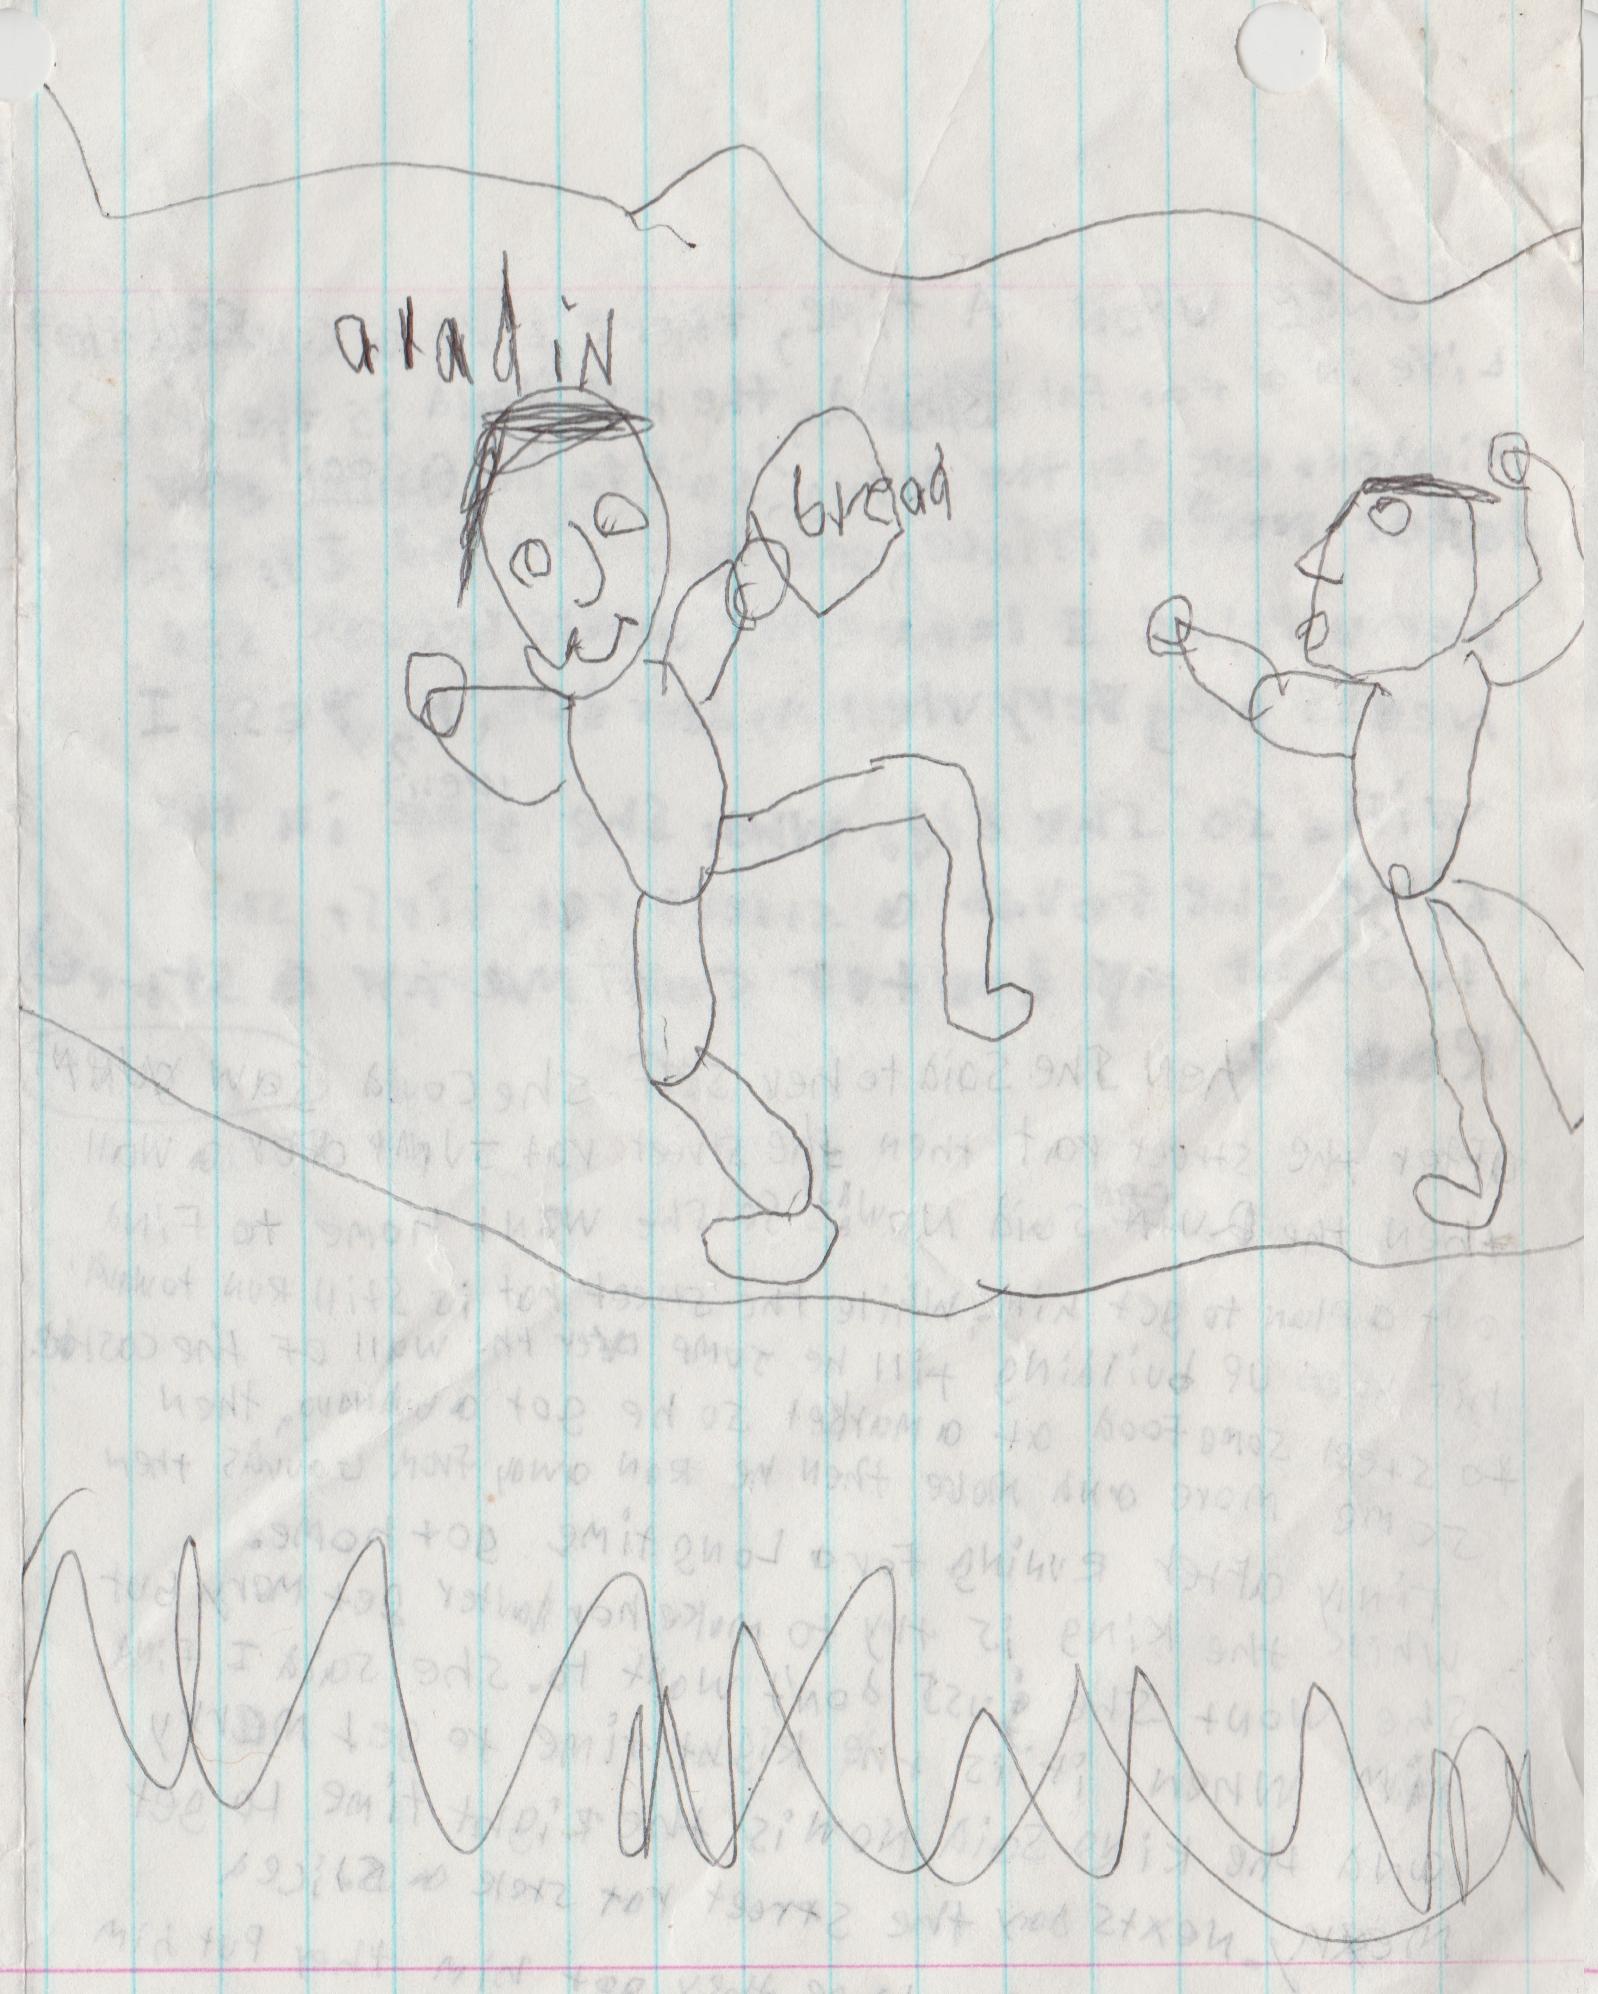 1995 maybe - Aladin Jasmin Queen Rat King Merry Story 03.jpg